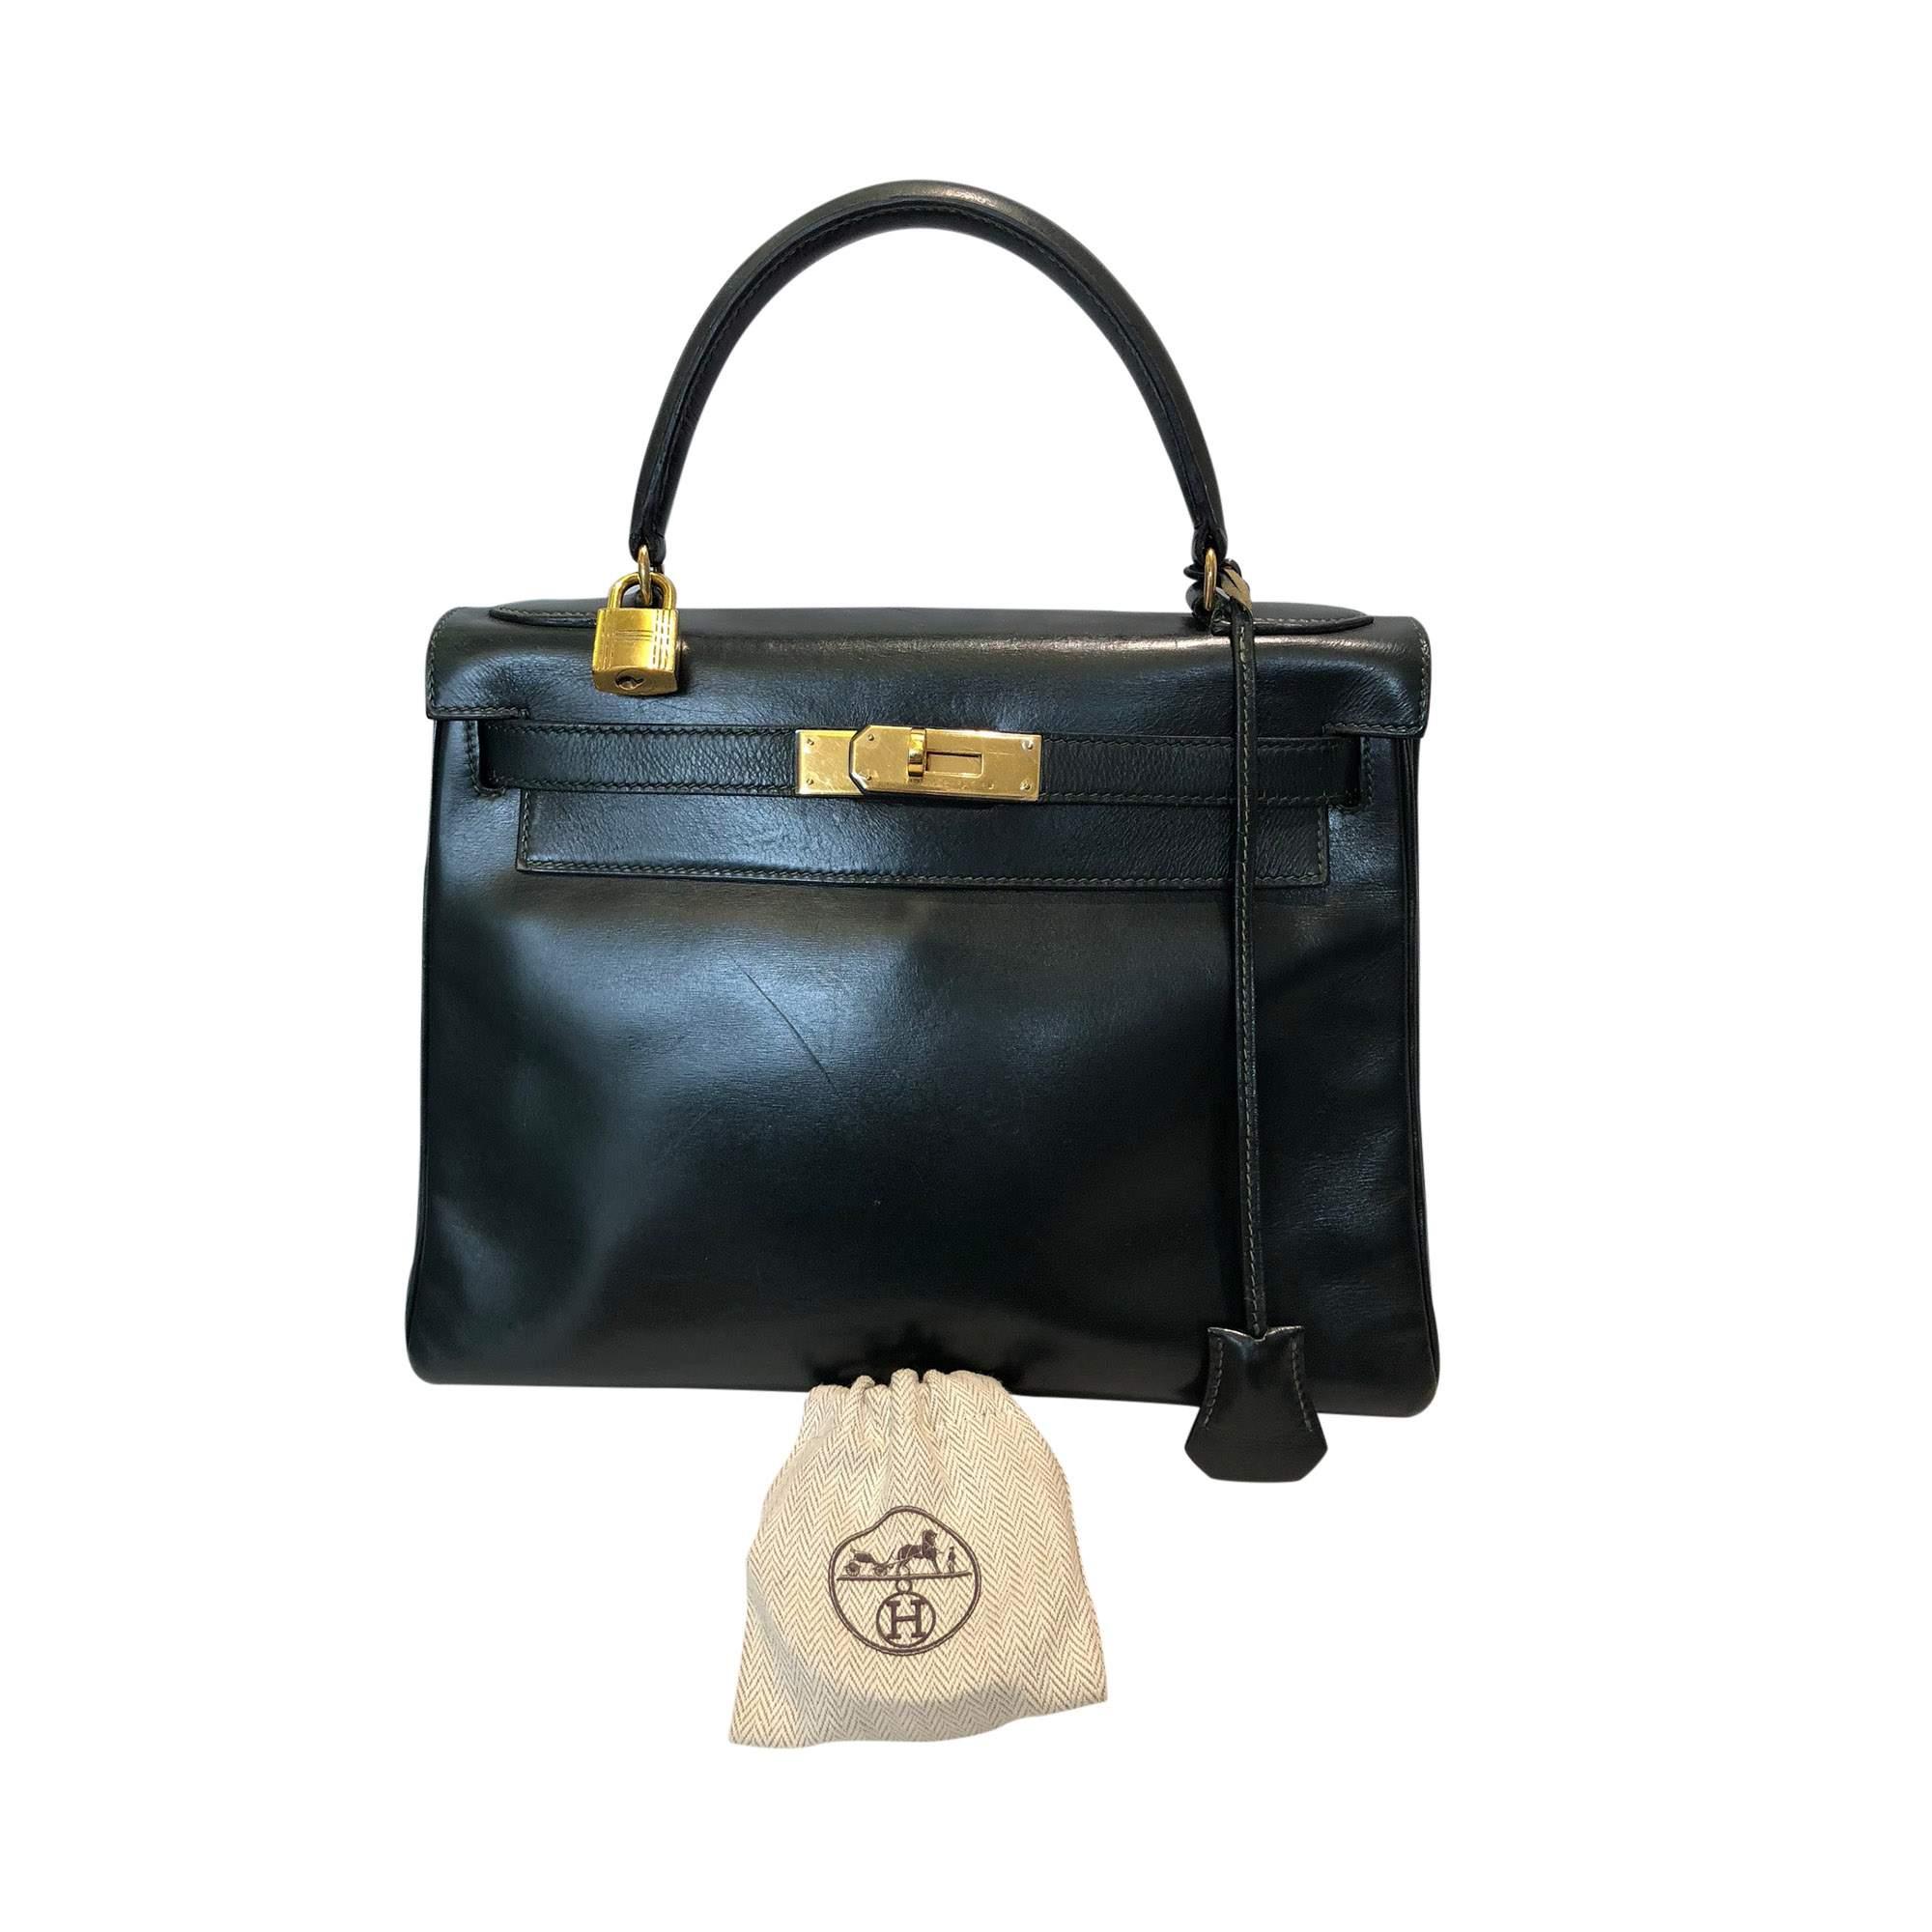 62b4911ed9 Hermes Vintage green Kelly 1988 Handbag